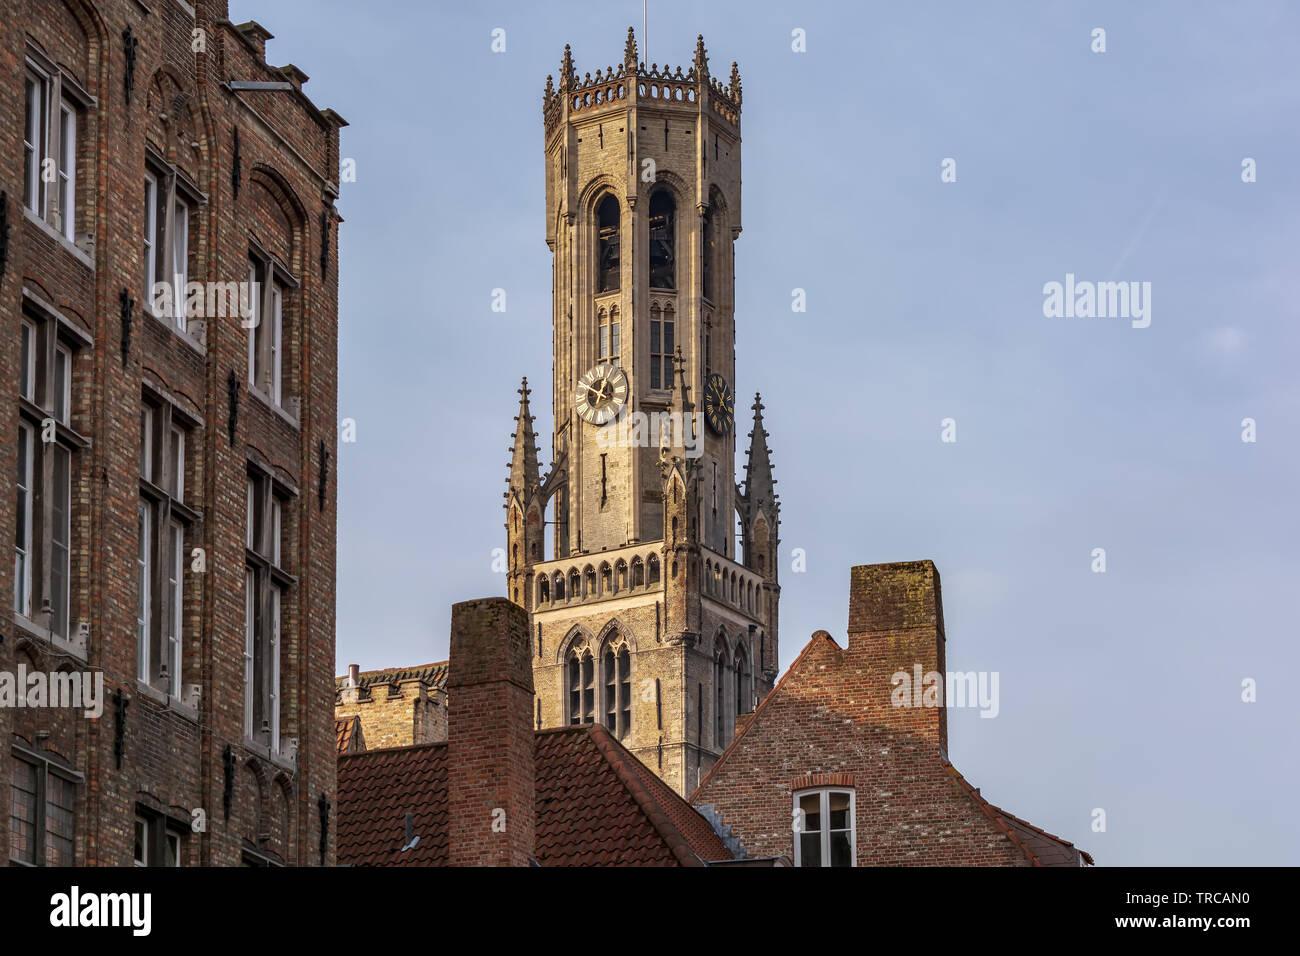 Belfry of Bruges, the medieval bell tower against blue sky. The 83 meter high belfry or hallstower (halletoren) is Bruges' most well-known landmark Stock Photo